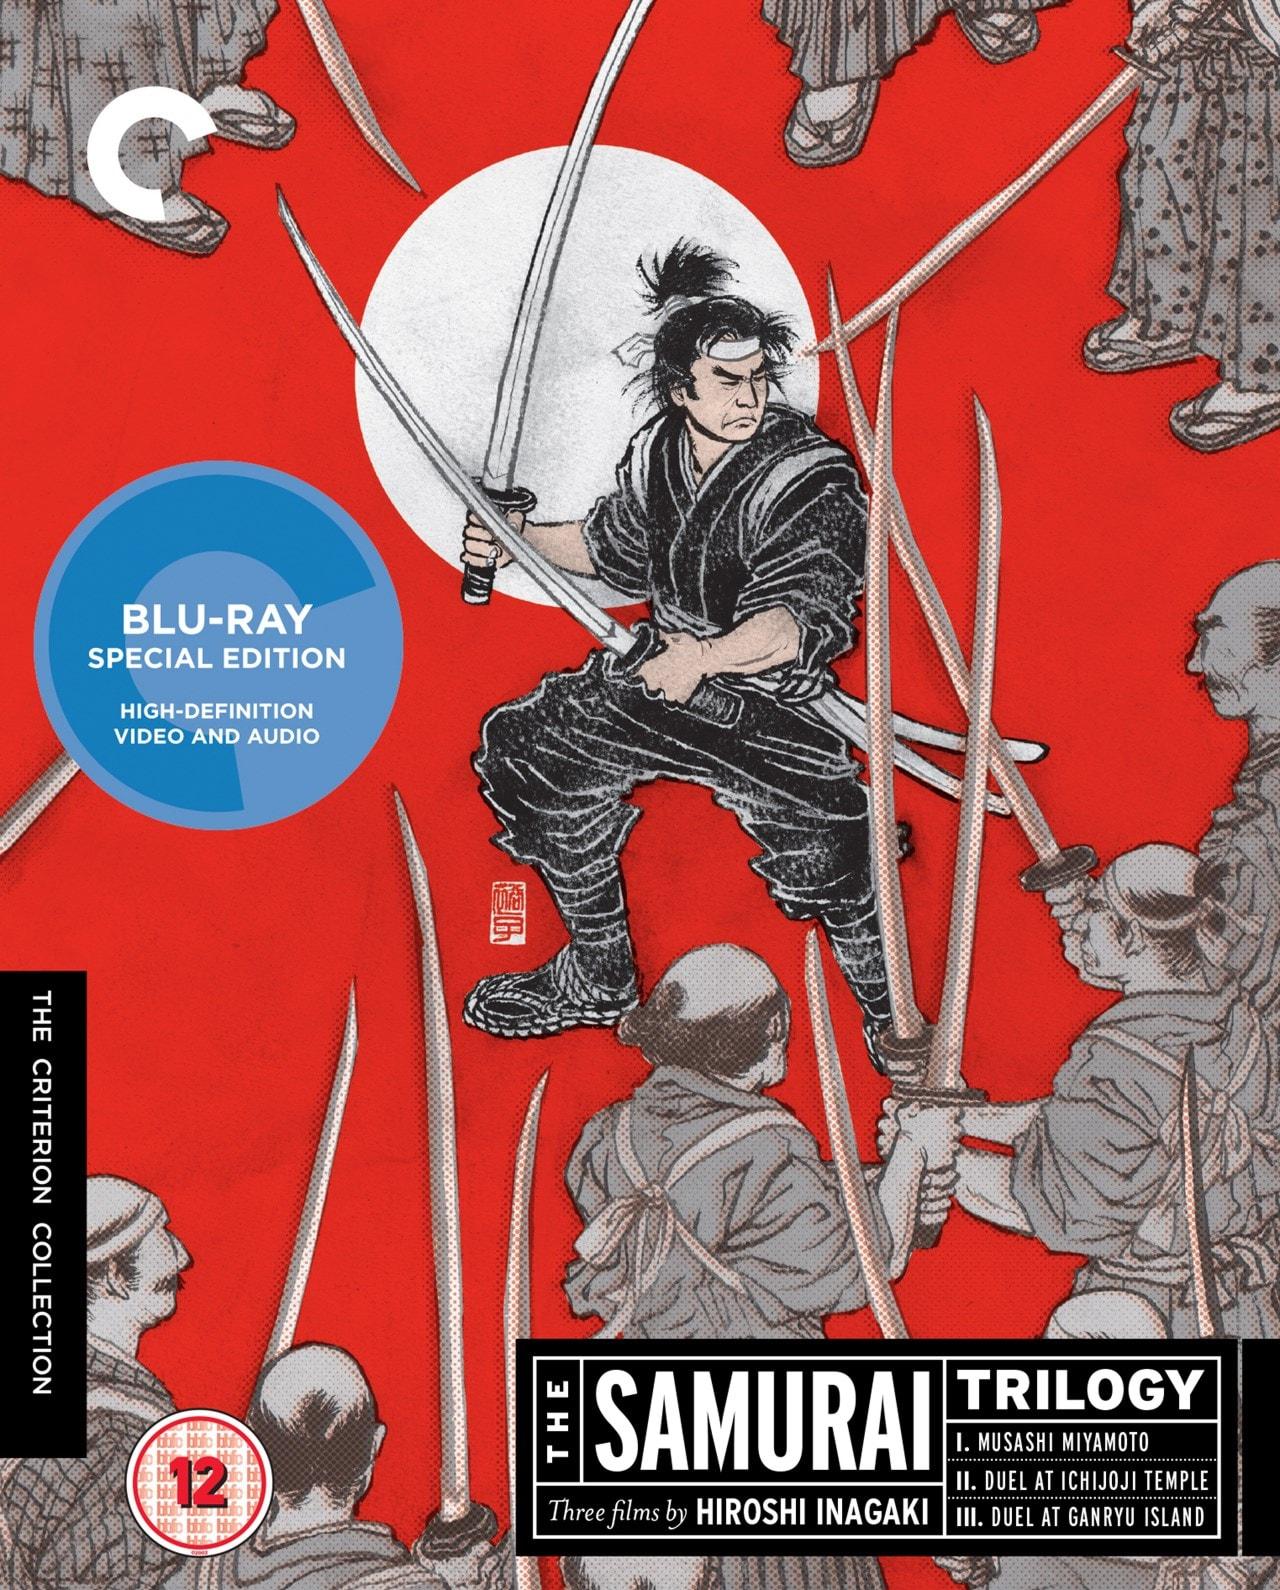 The Samurai Trilogy - The Criterion Collection - 1